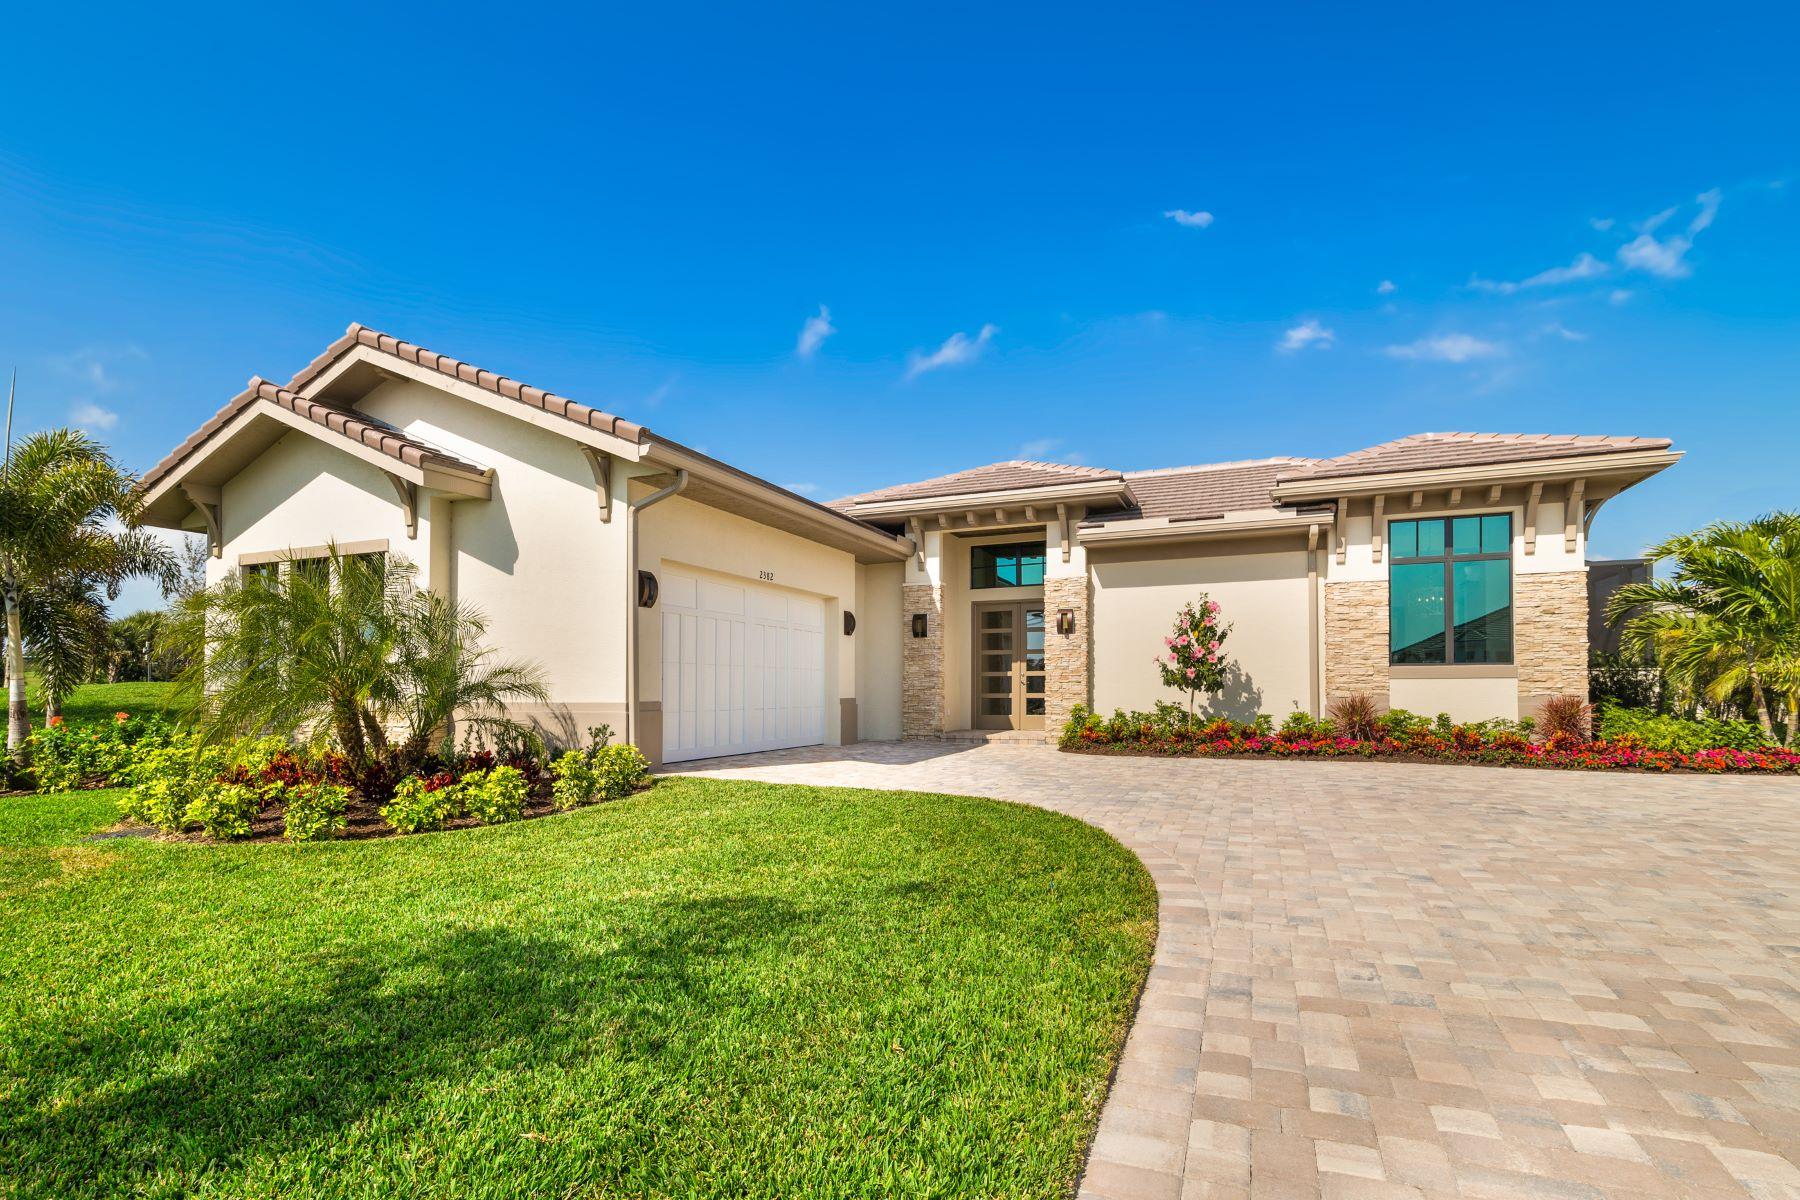 Luxury New Home in the Reserve at Grand Harbor 2348 Grand Harbor Reserve Vero Beach, Florida 32967 Vereinigte Staaten